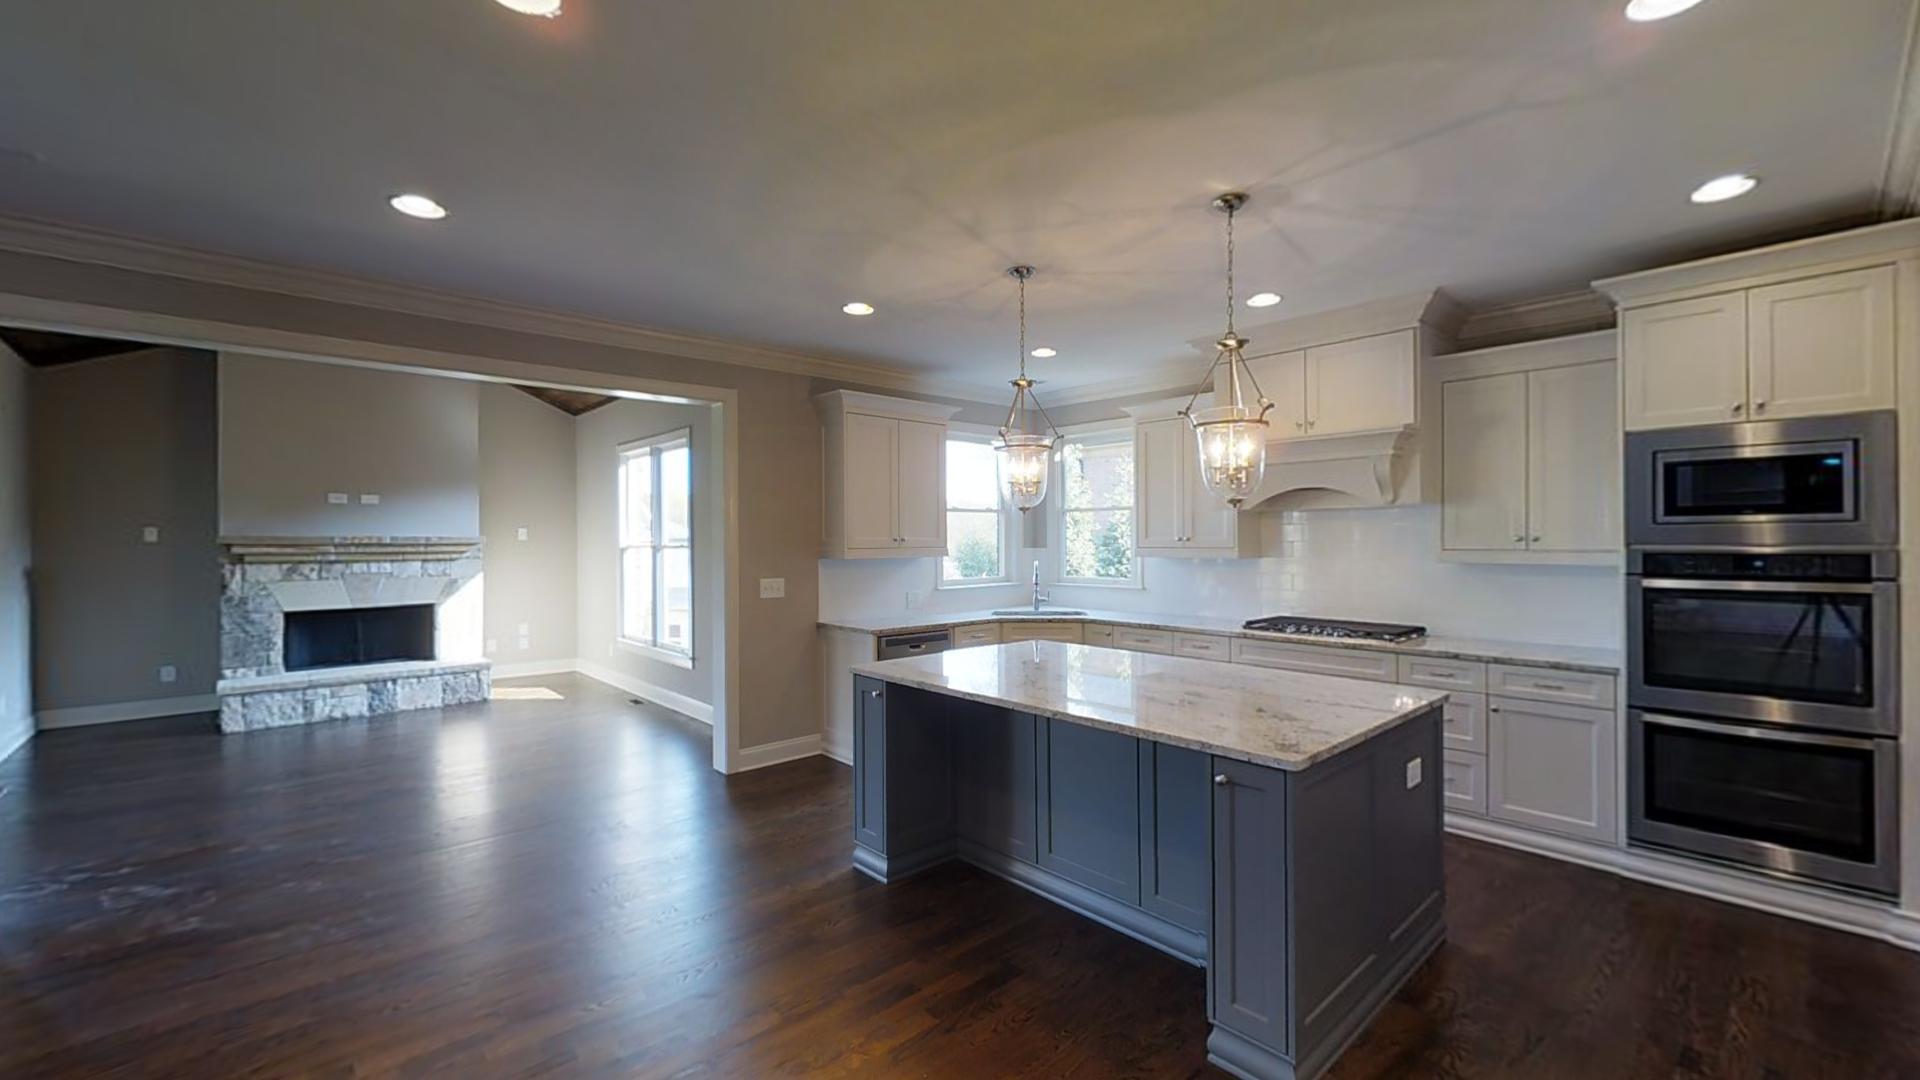 SR Homes: The Kessington Plan at Rowan Oaks